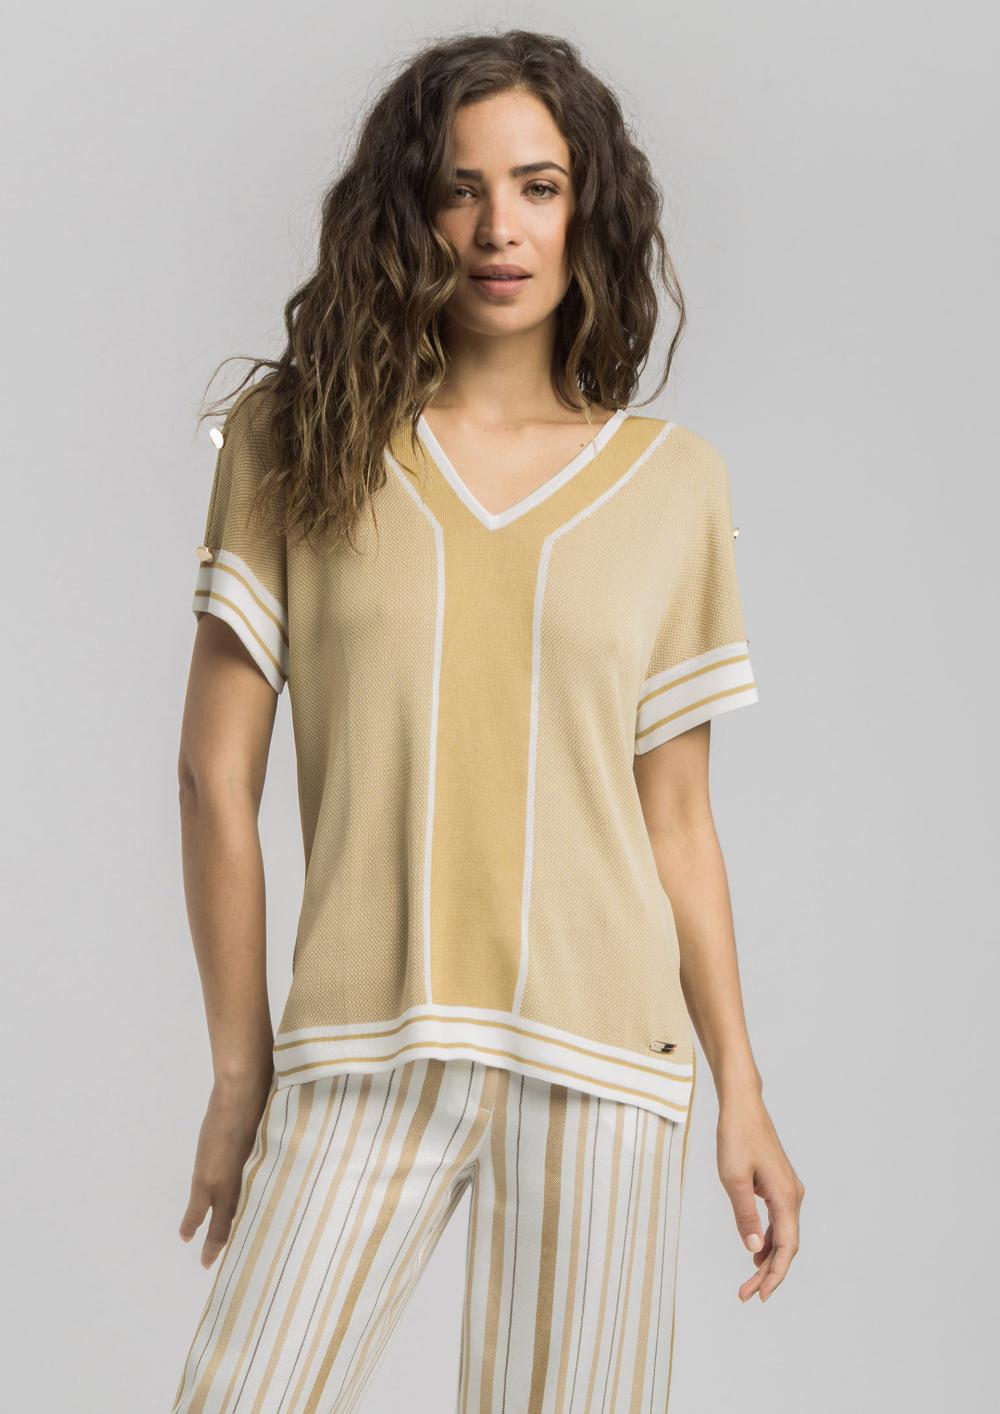 Top de punto de Alba Conde #fashion #brand #inspiration #inspo #outfit #look #newcollection #ss20